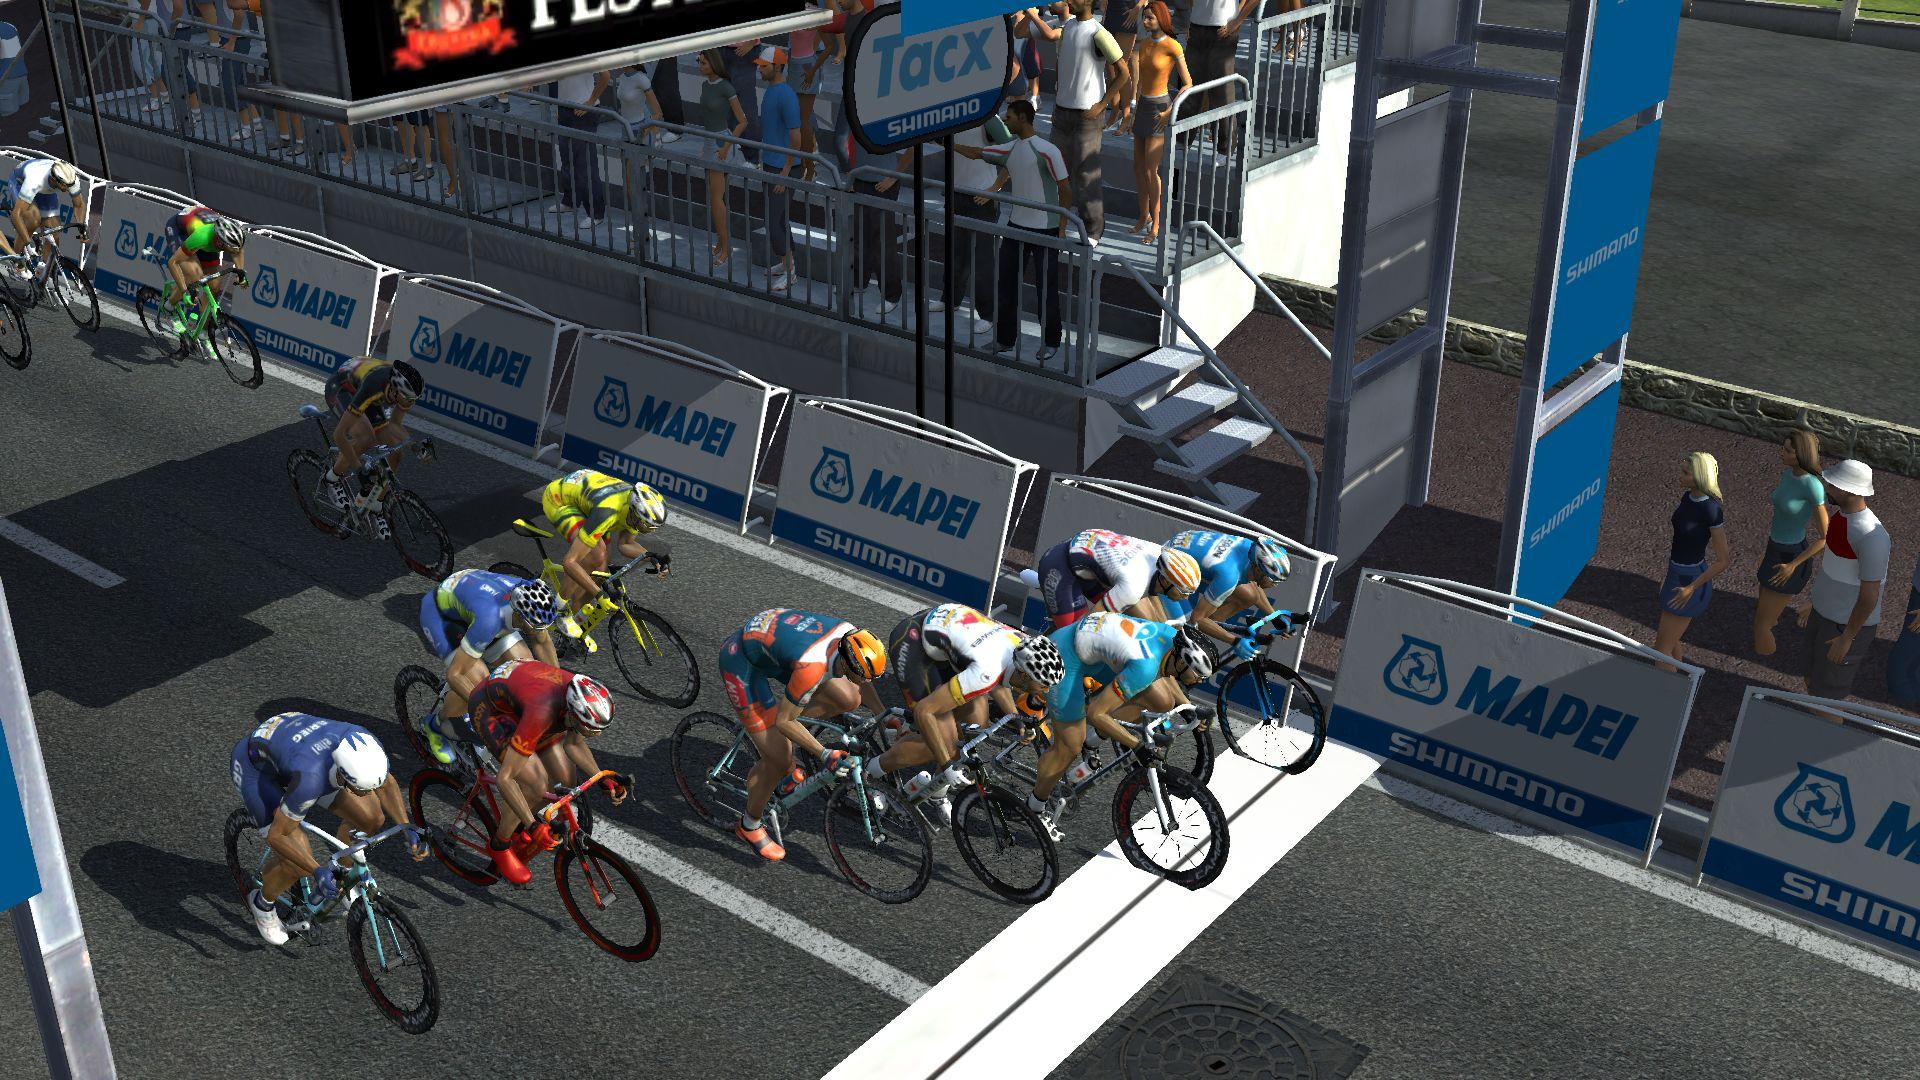 pcmdaily.com/images/mg/2016/Races/PT/Vuelta/mg2016_vuelta_01_PCM0057.jpg